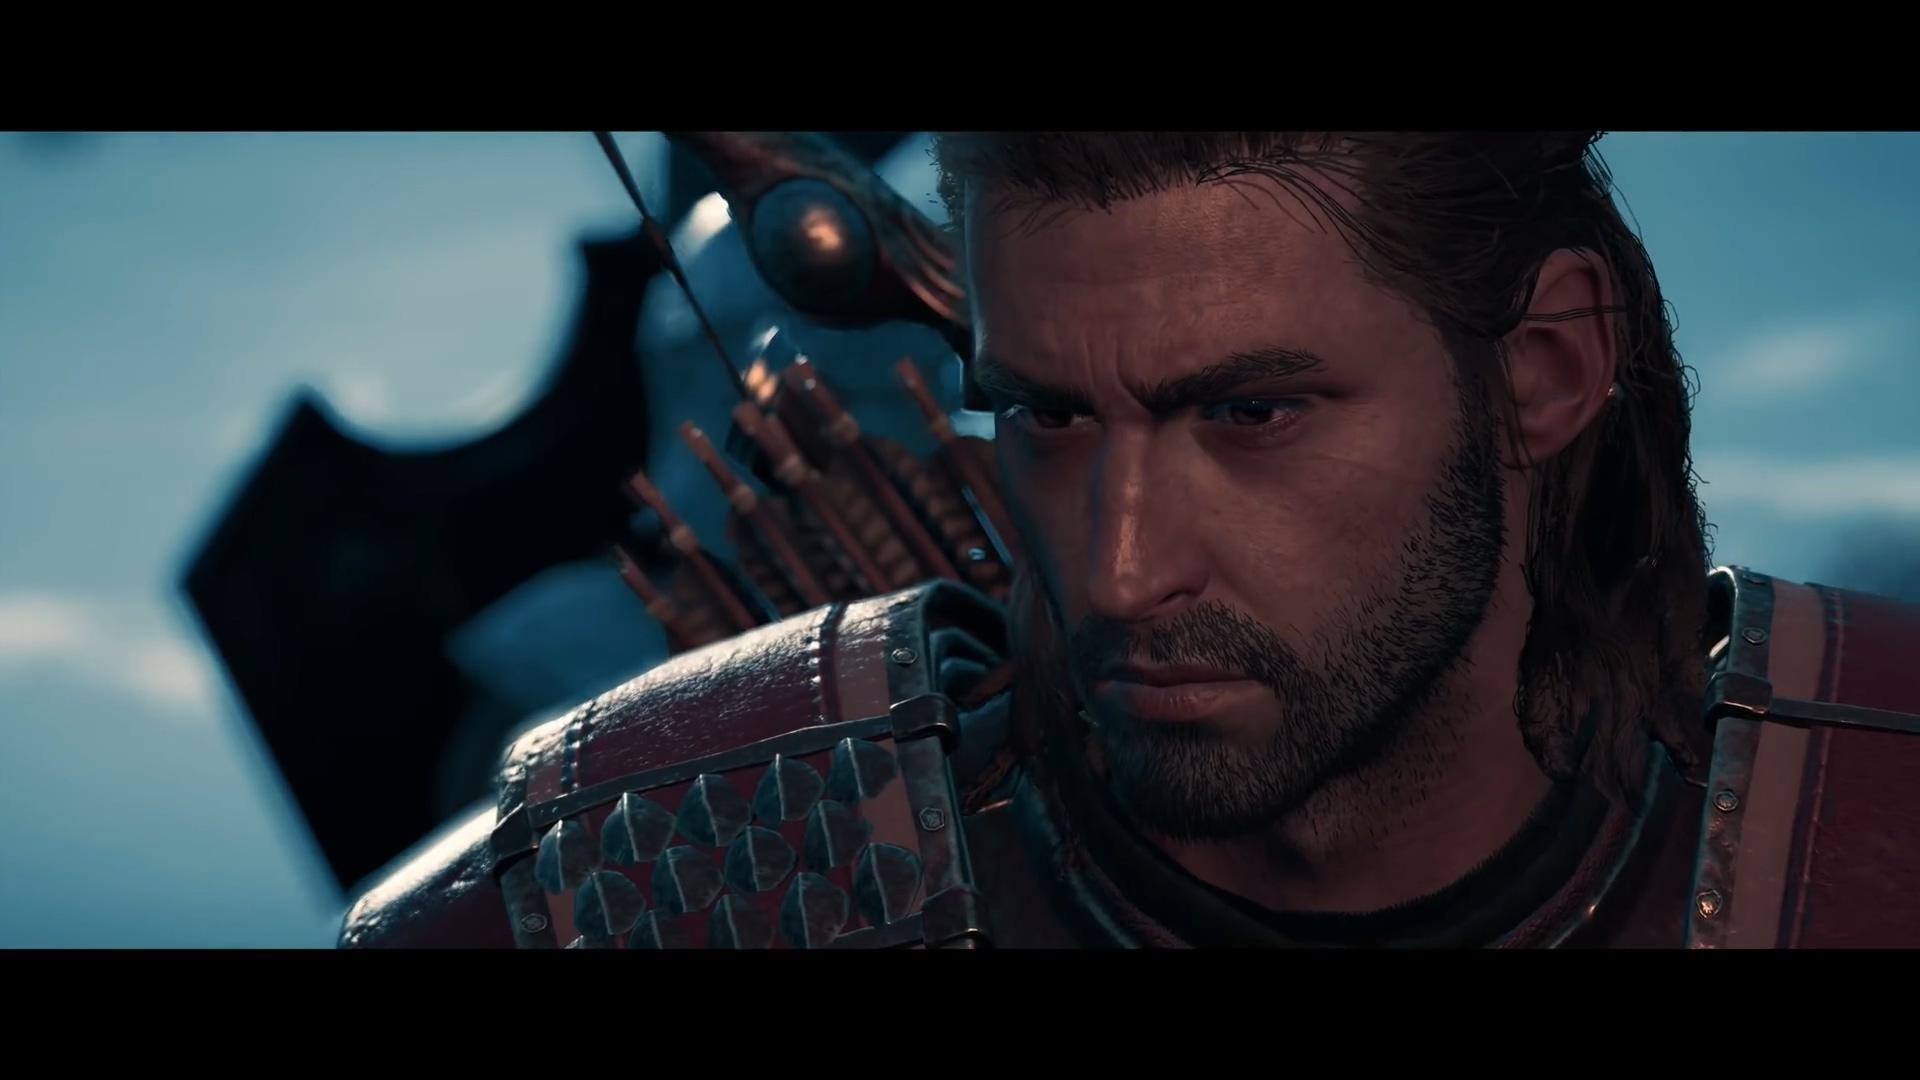 <b>讲述袖剑起源《刺客信条:奥德赛》首个DLC预告</b>